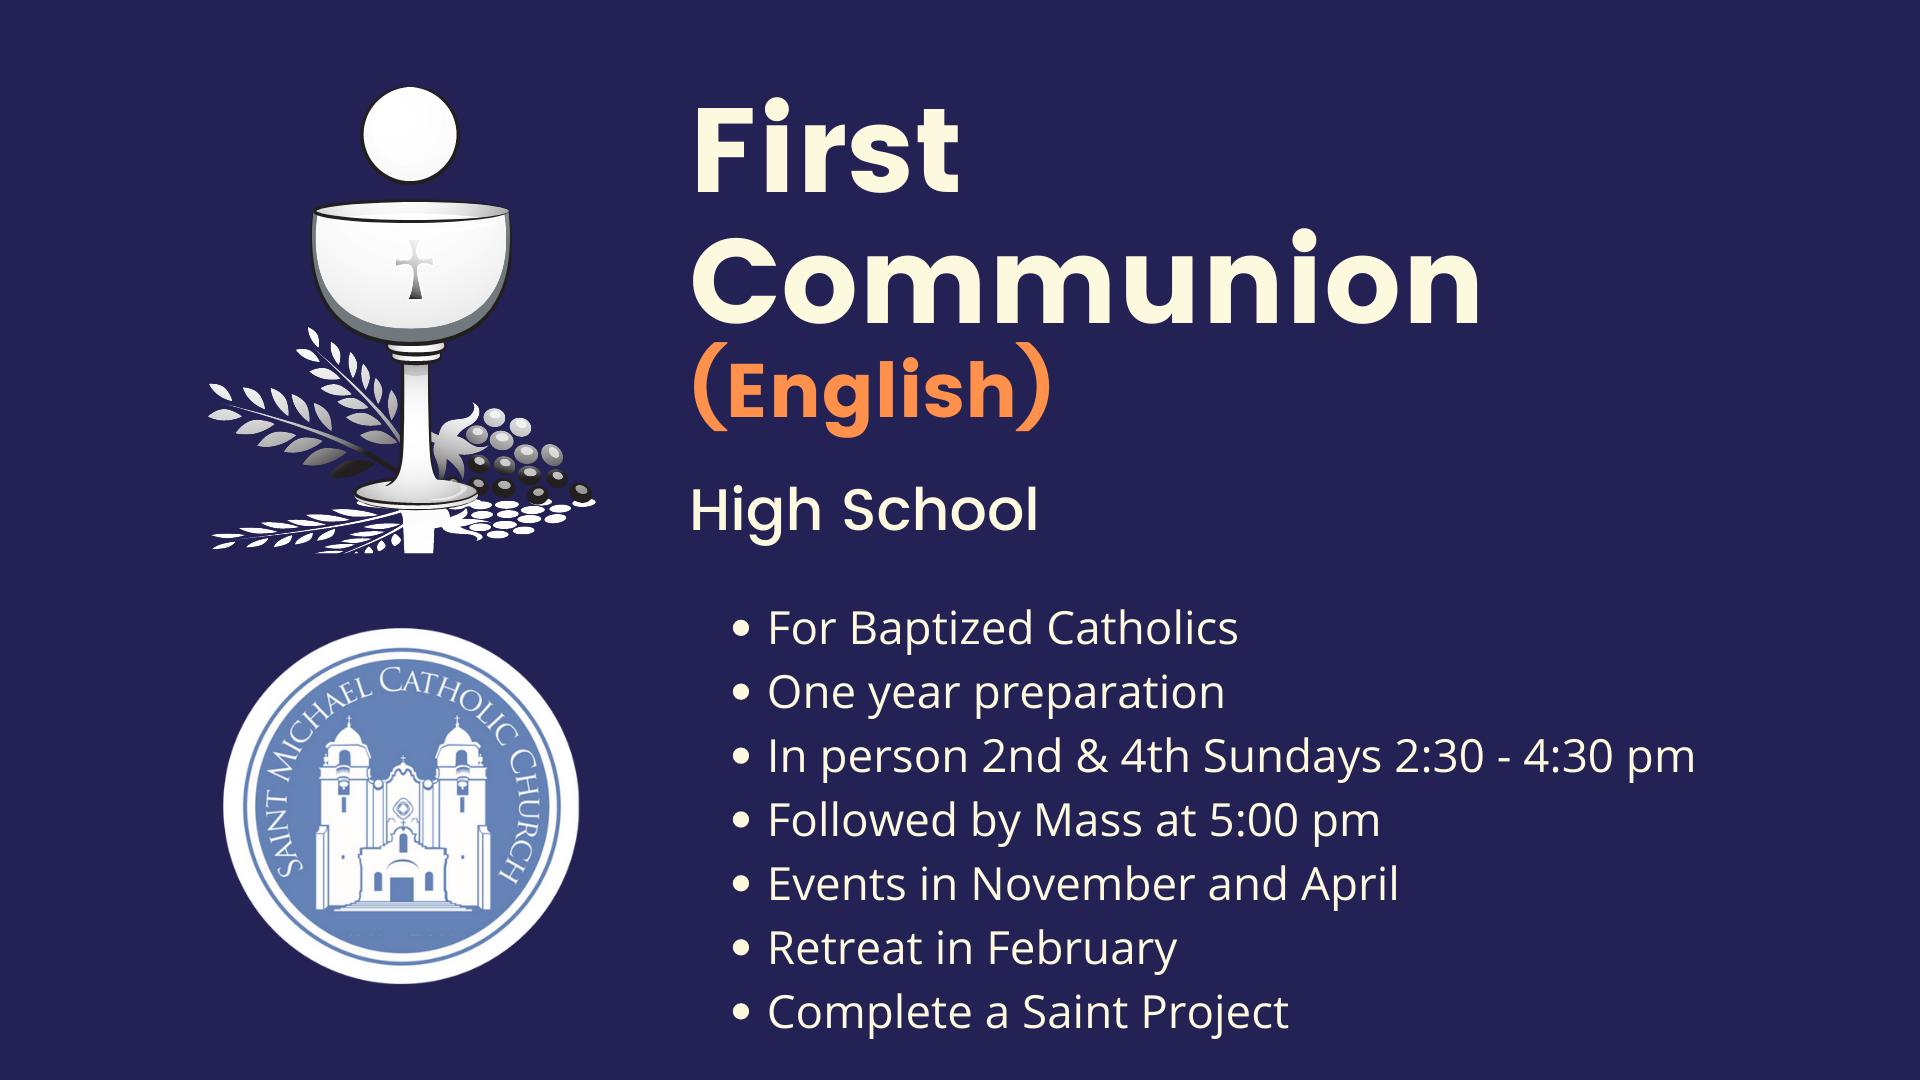 First Communion English High School